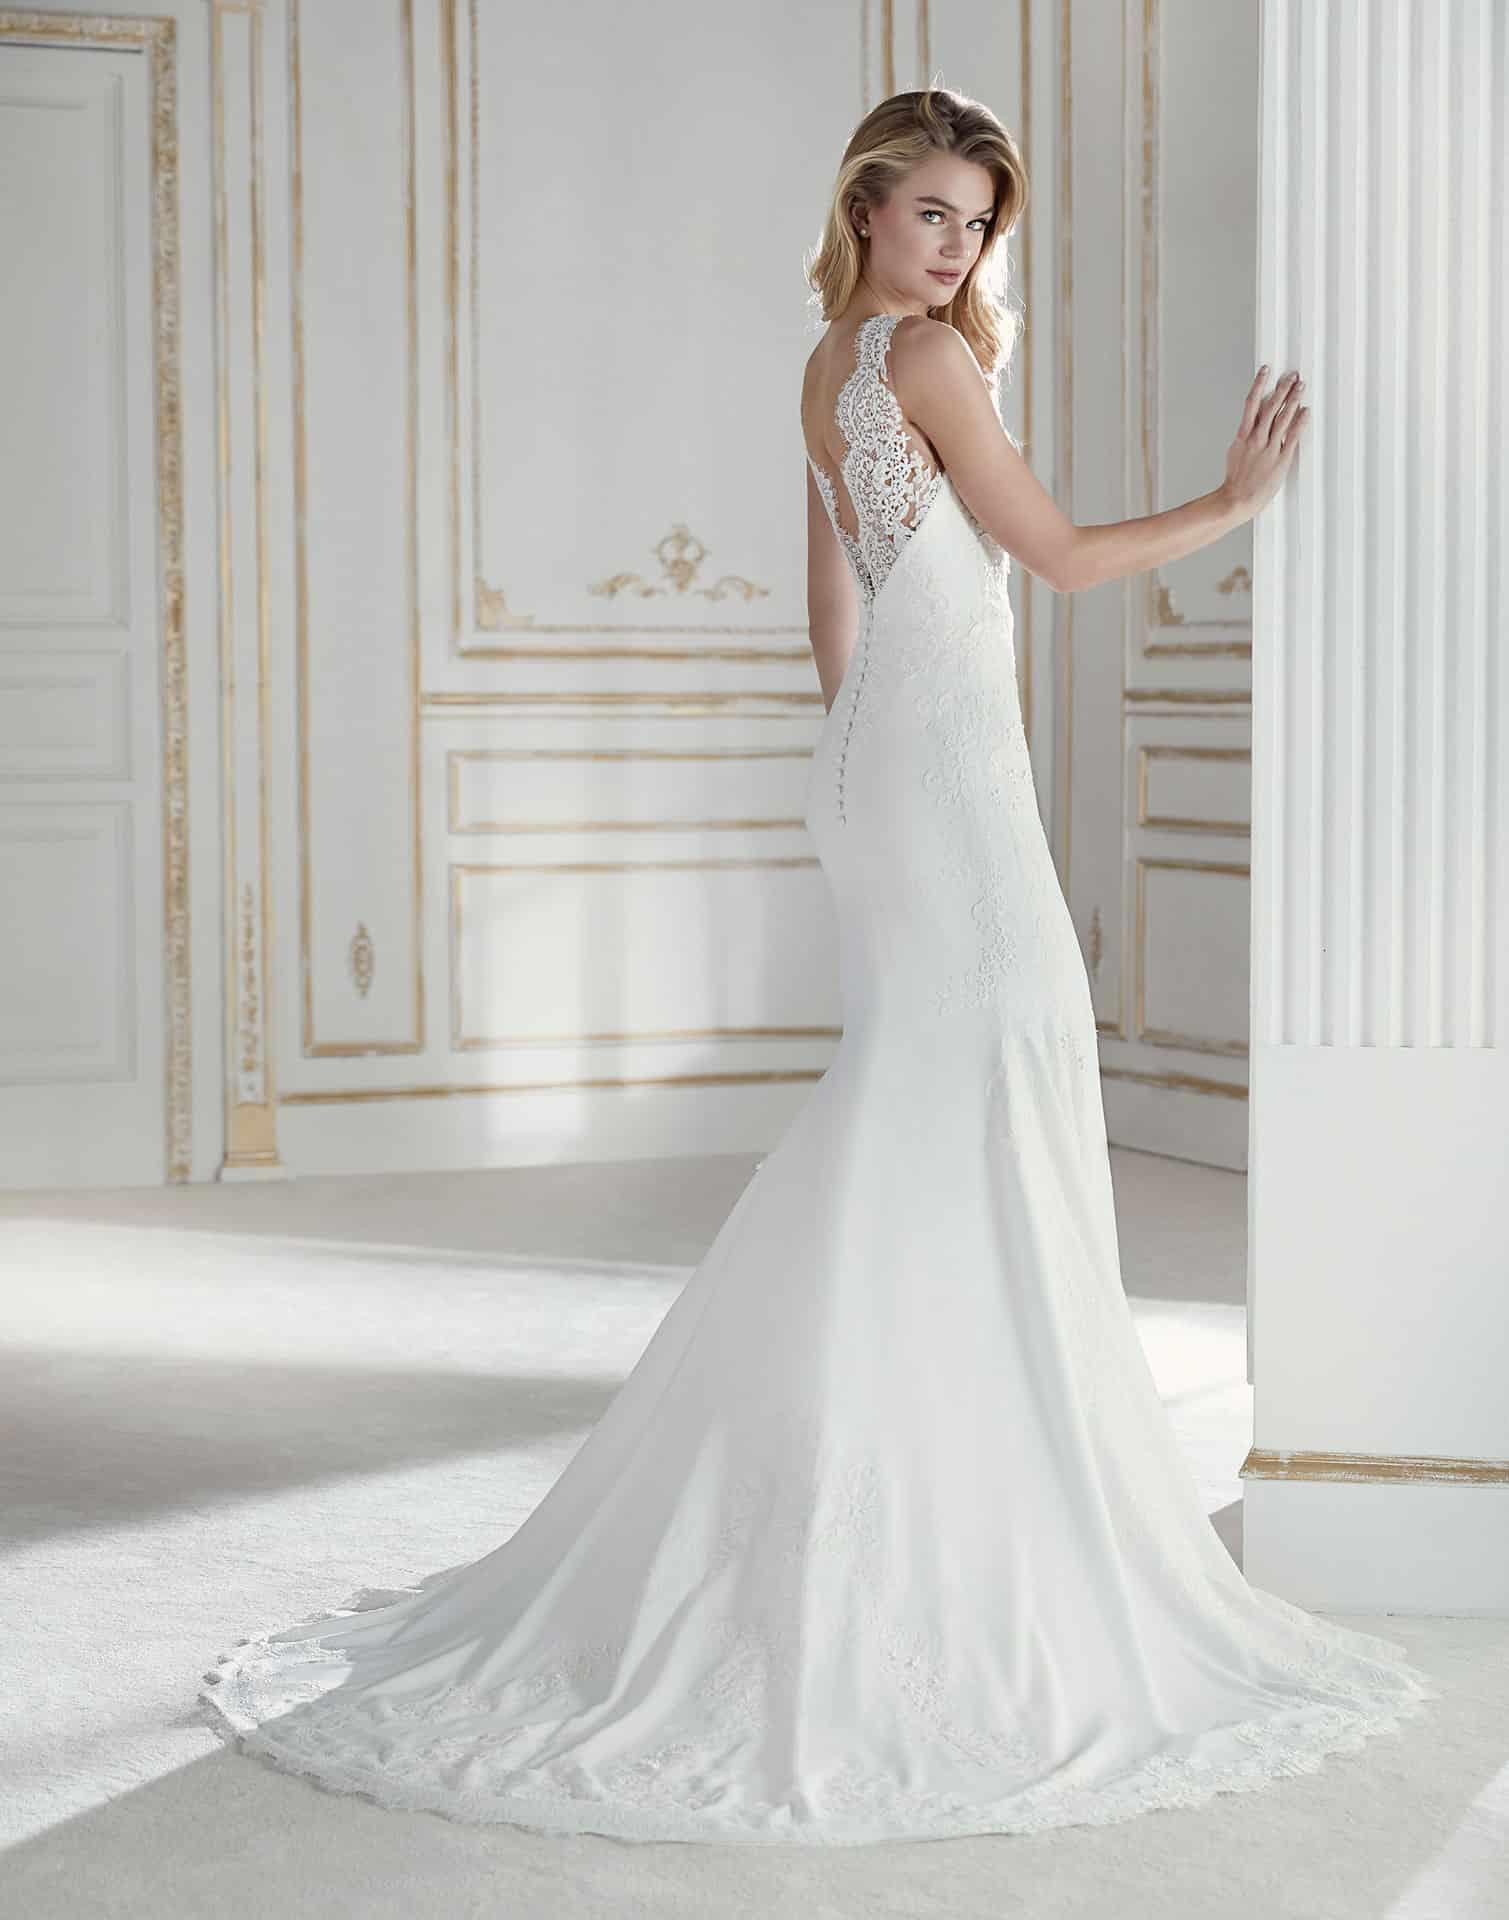 Wedding Dresses Gallery 43